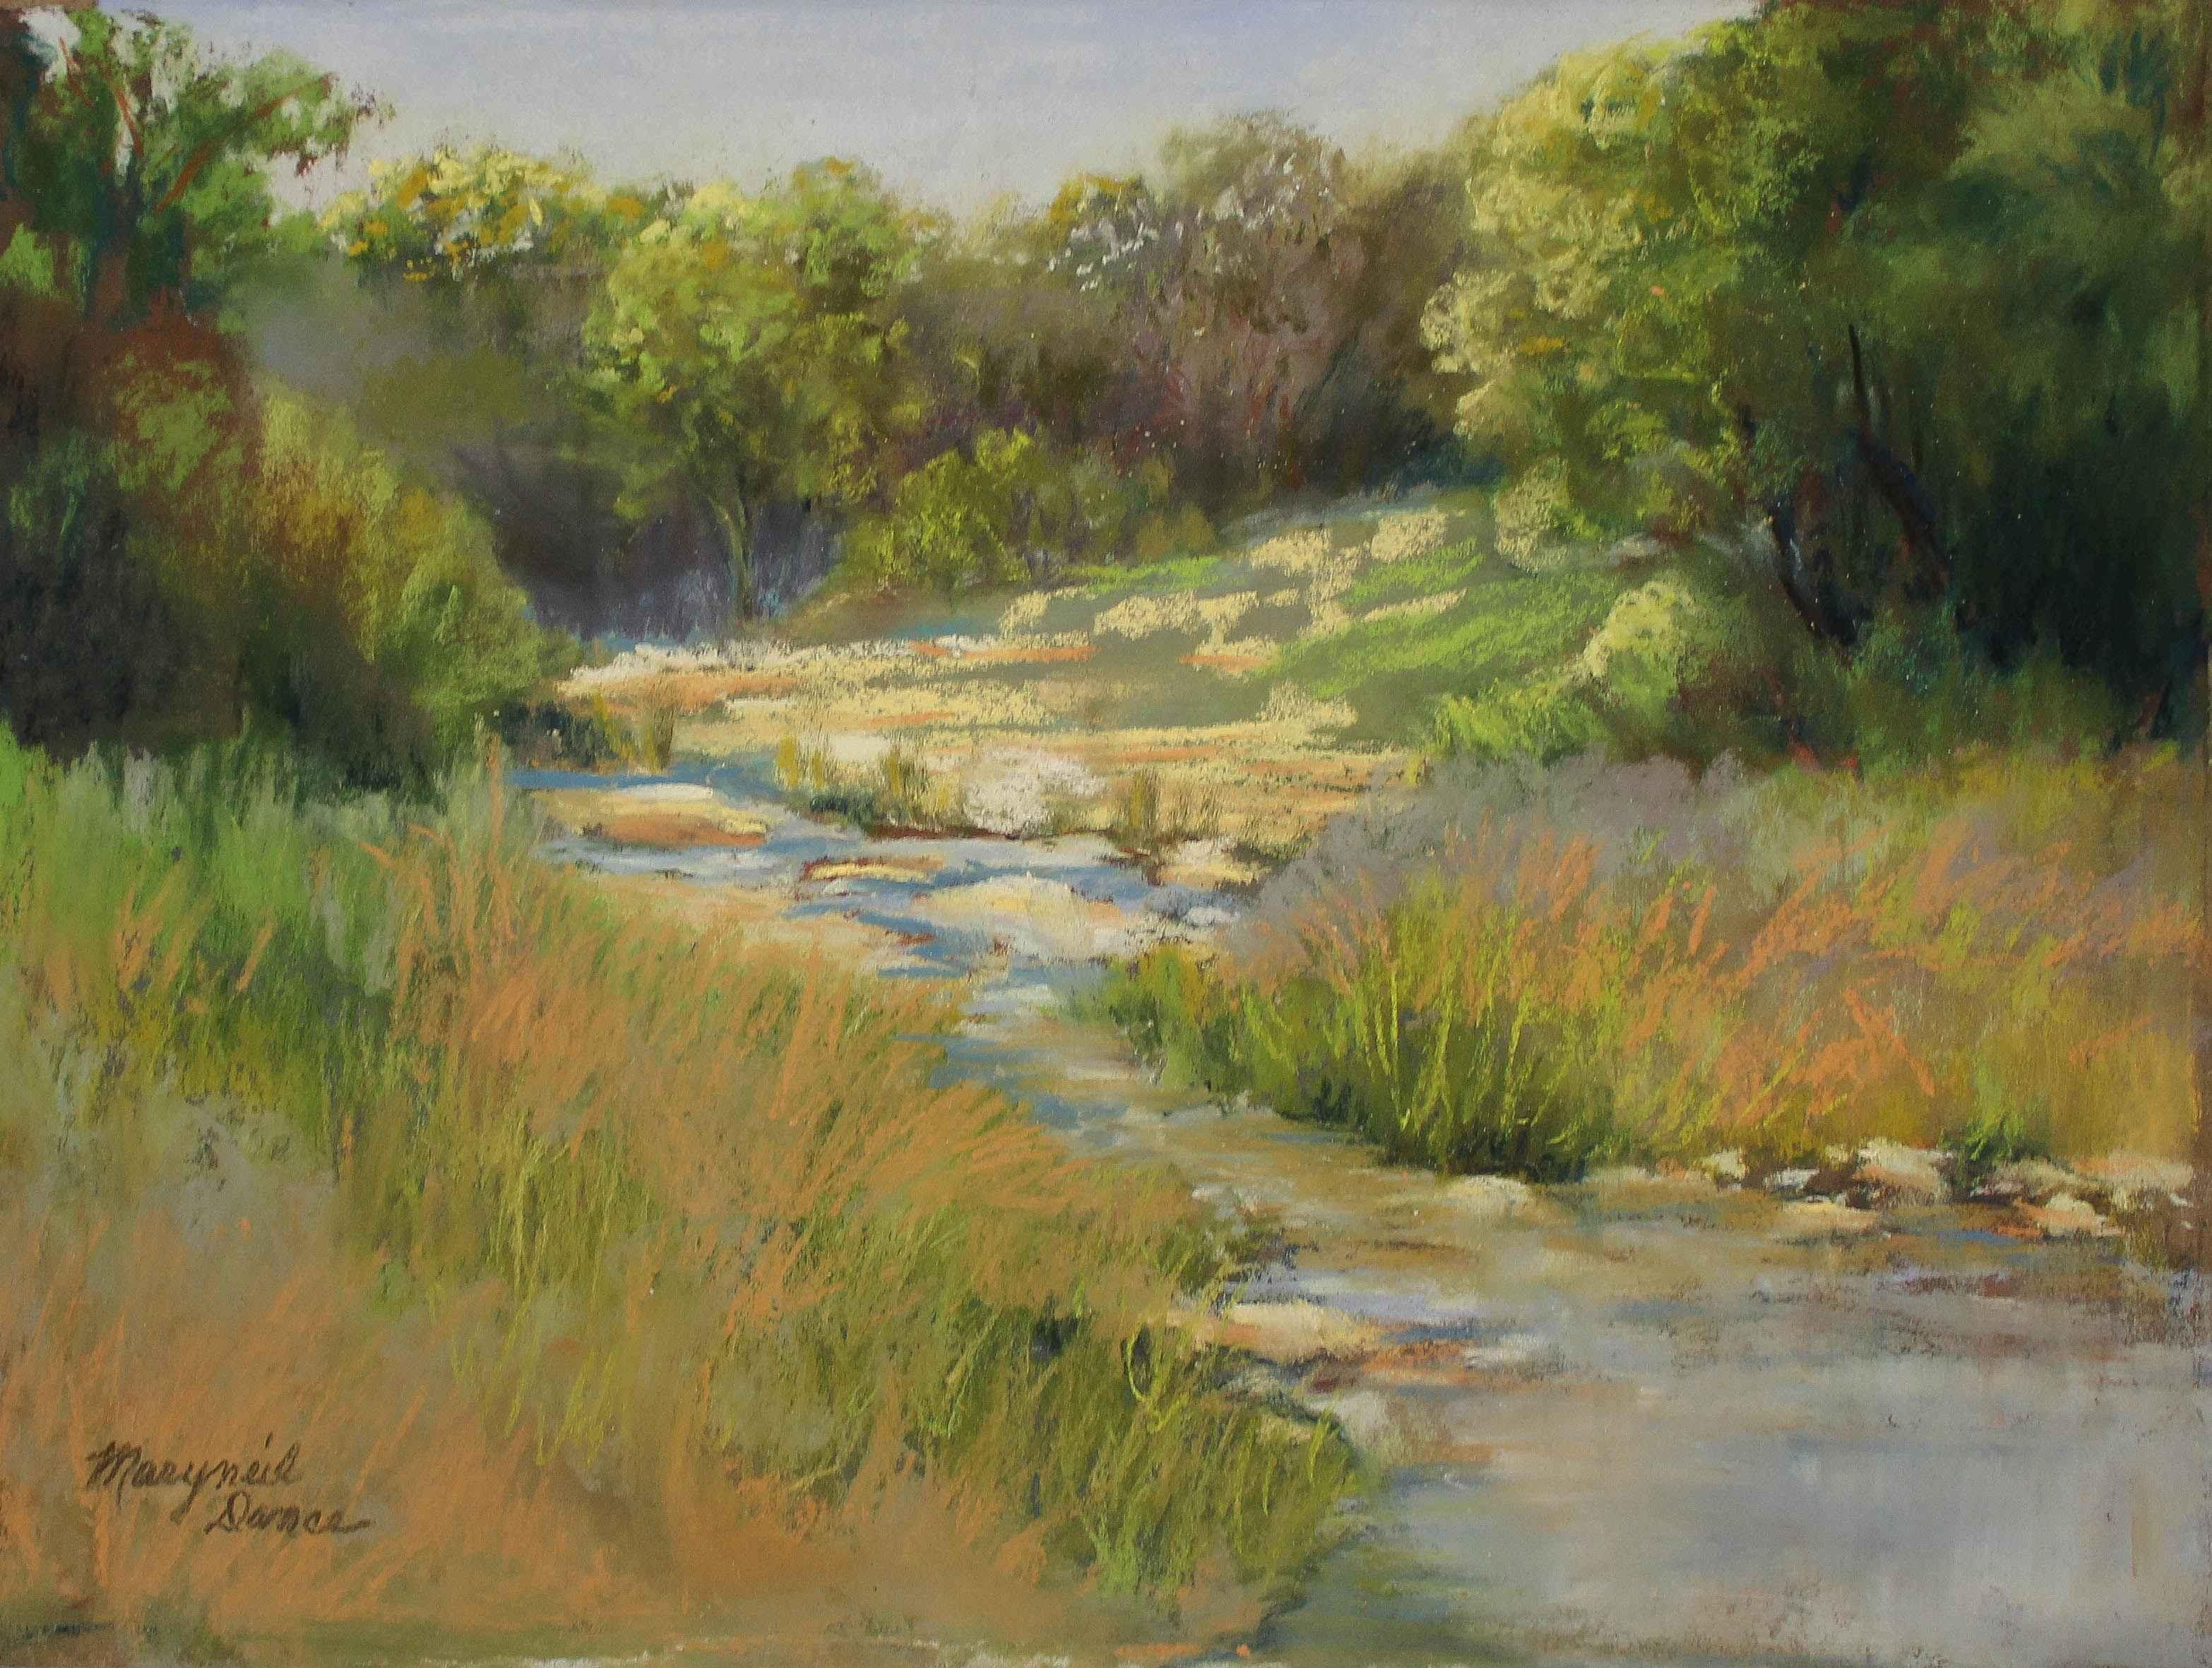 Limestone Creek by  Maryneil Dance - Masterpiece Online